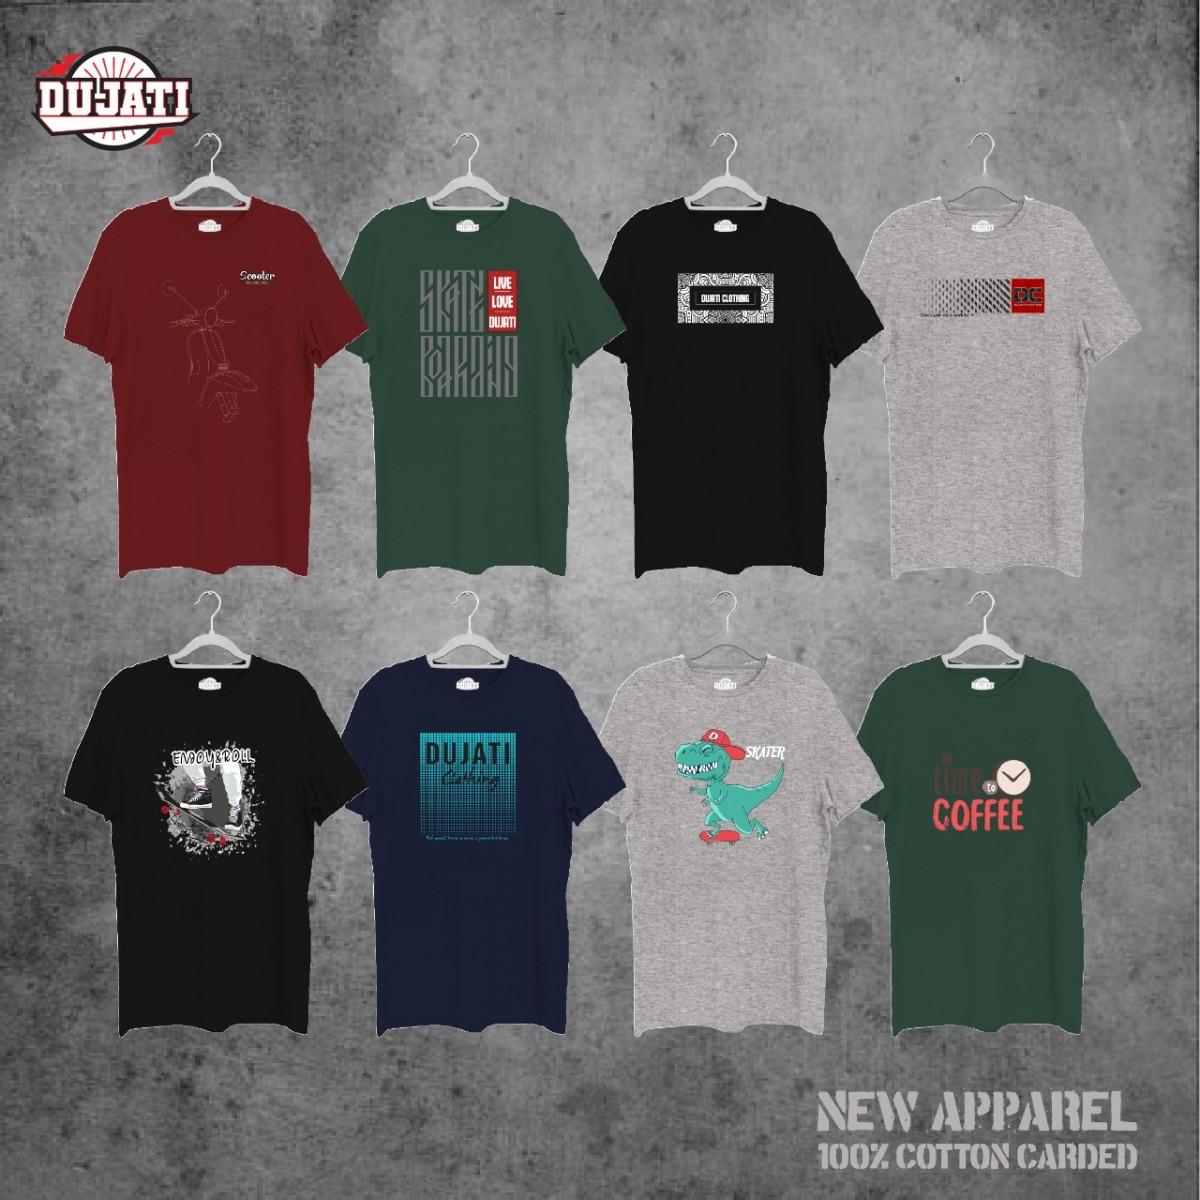 Grosir Baju Distro Bandung Murah Grosir Baju Distro Bandung Murah